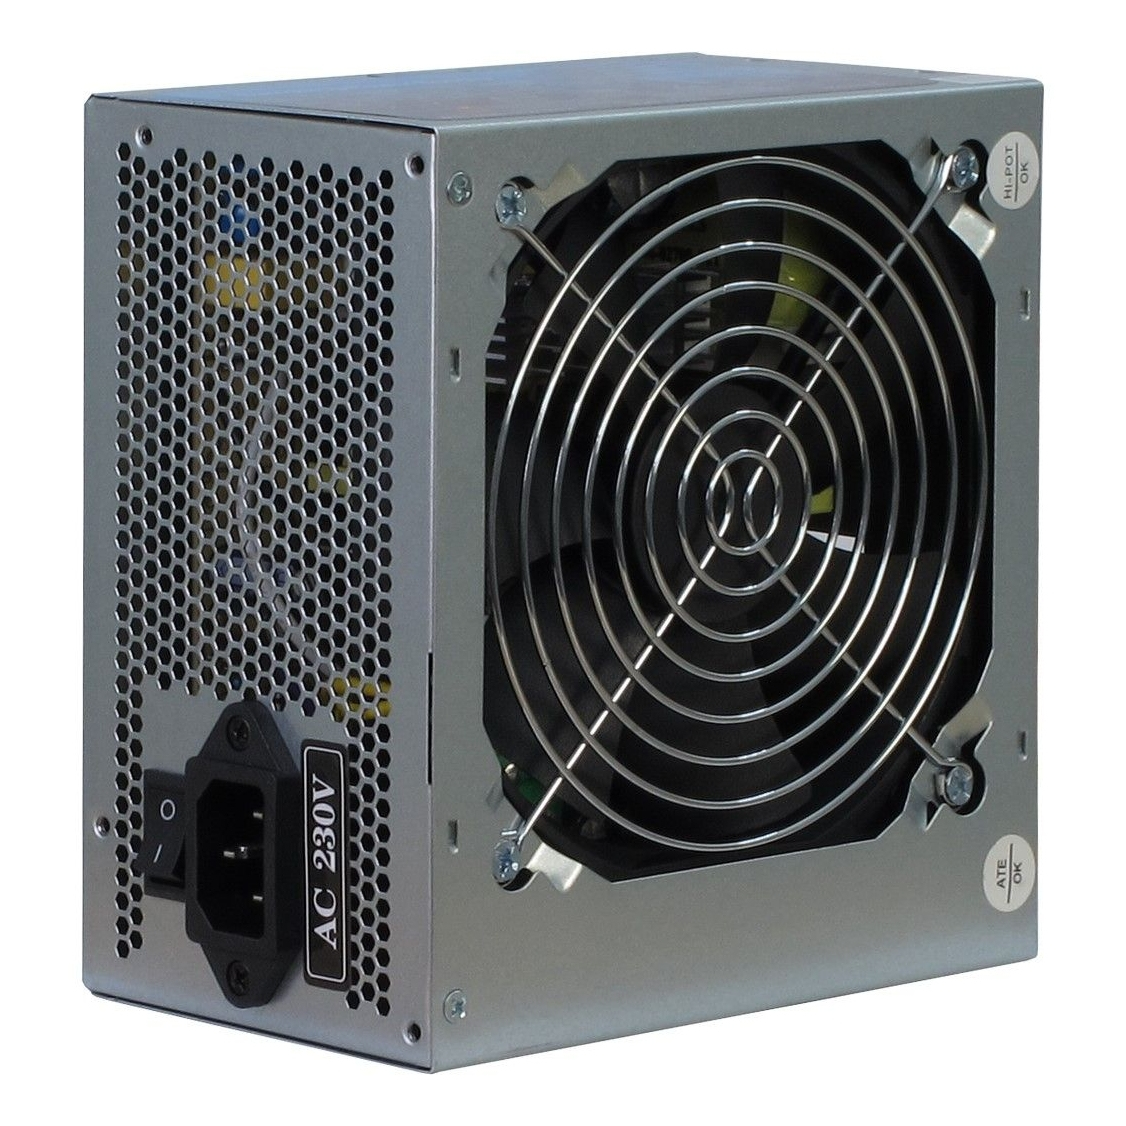 InterTech SL500A 500 W 230 V 60 Hz +12V,+3.3V,+5V,+5Vsb,12V Passive 220 W